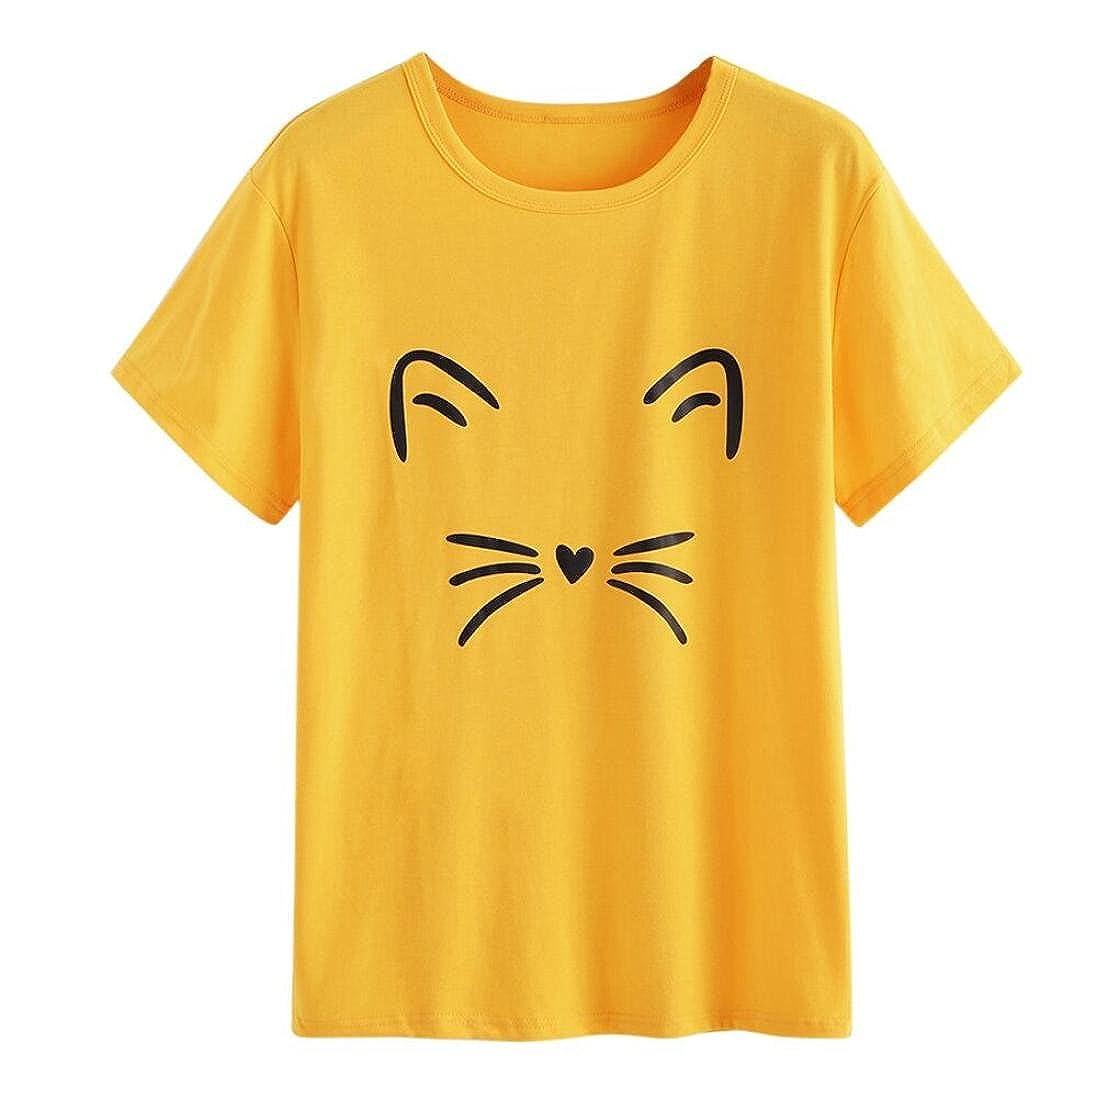 74188b2ea5966 Amazon.com  Lamolory Women s ST. Patrick s Day Green V-Neck Short Sleeve  Tee Tops 5.0 Out Of 5 Stars  Clothing